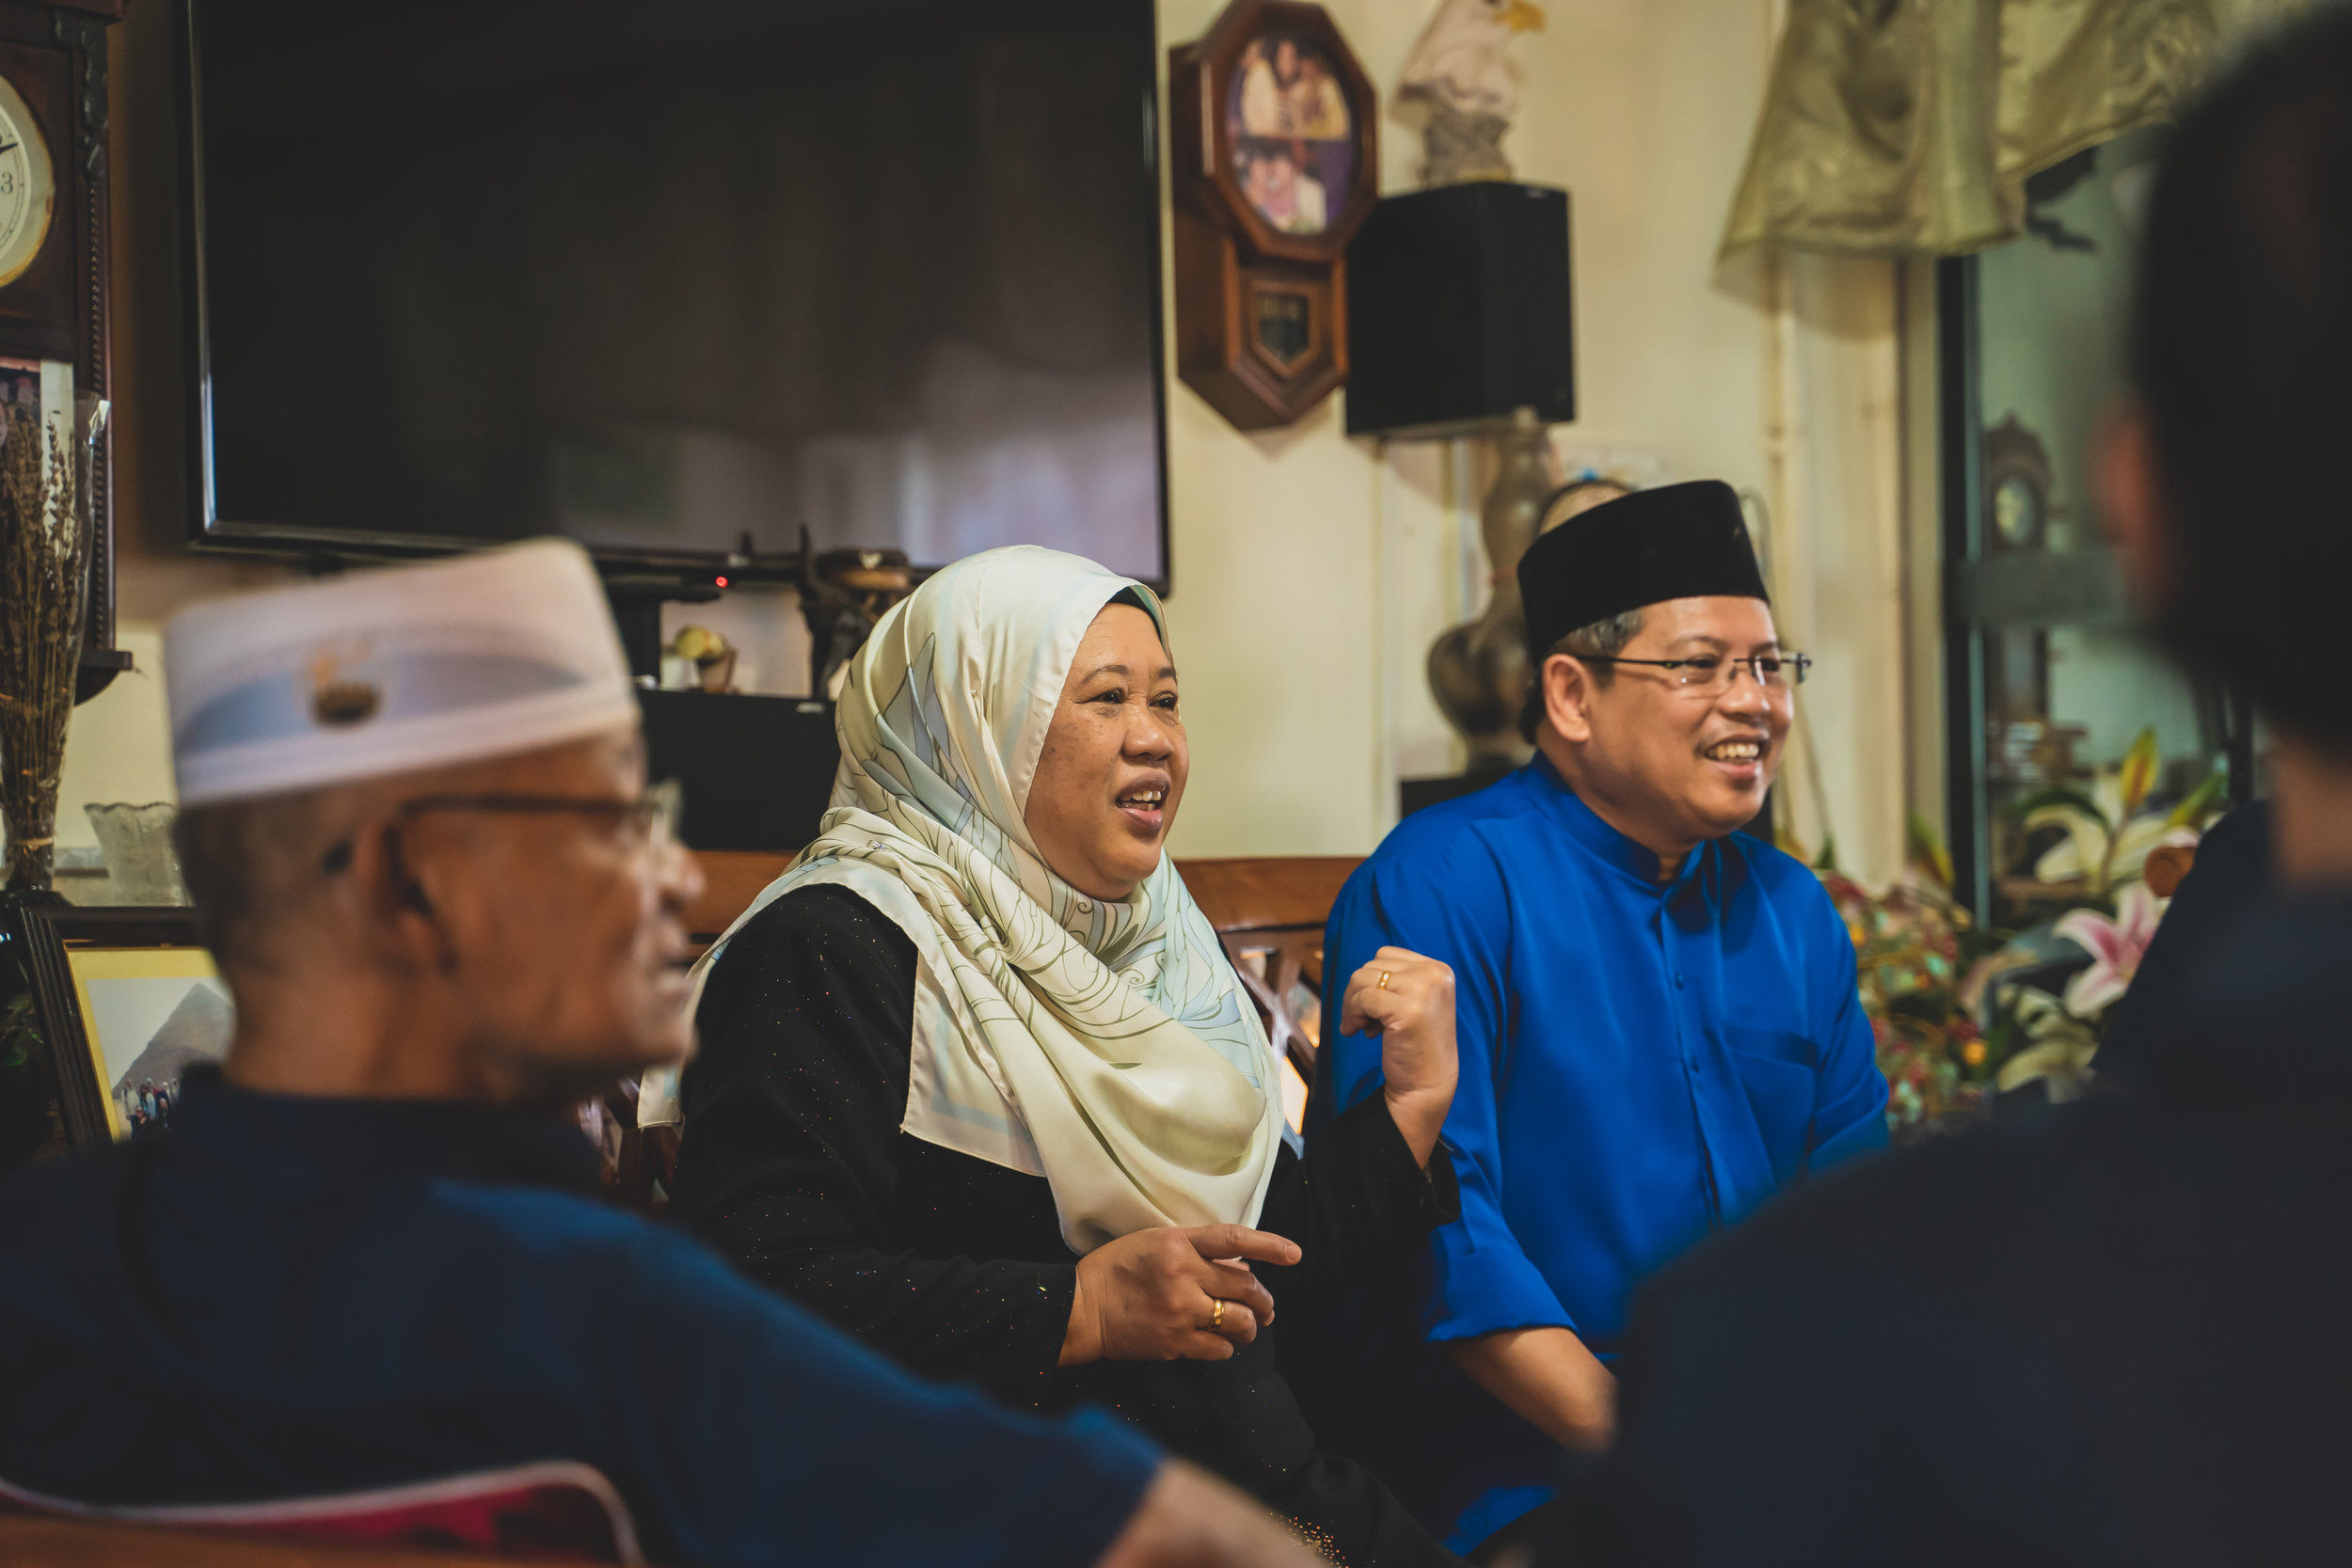 Singapore malay wedding videography services